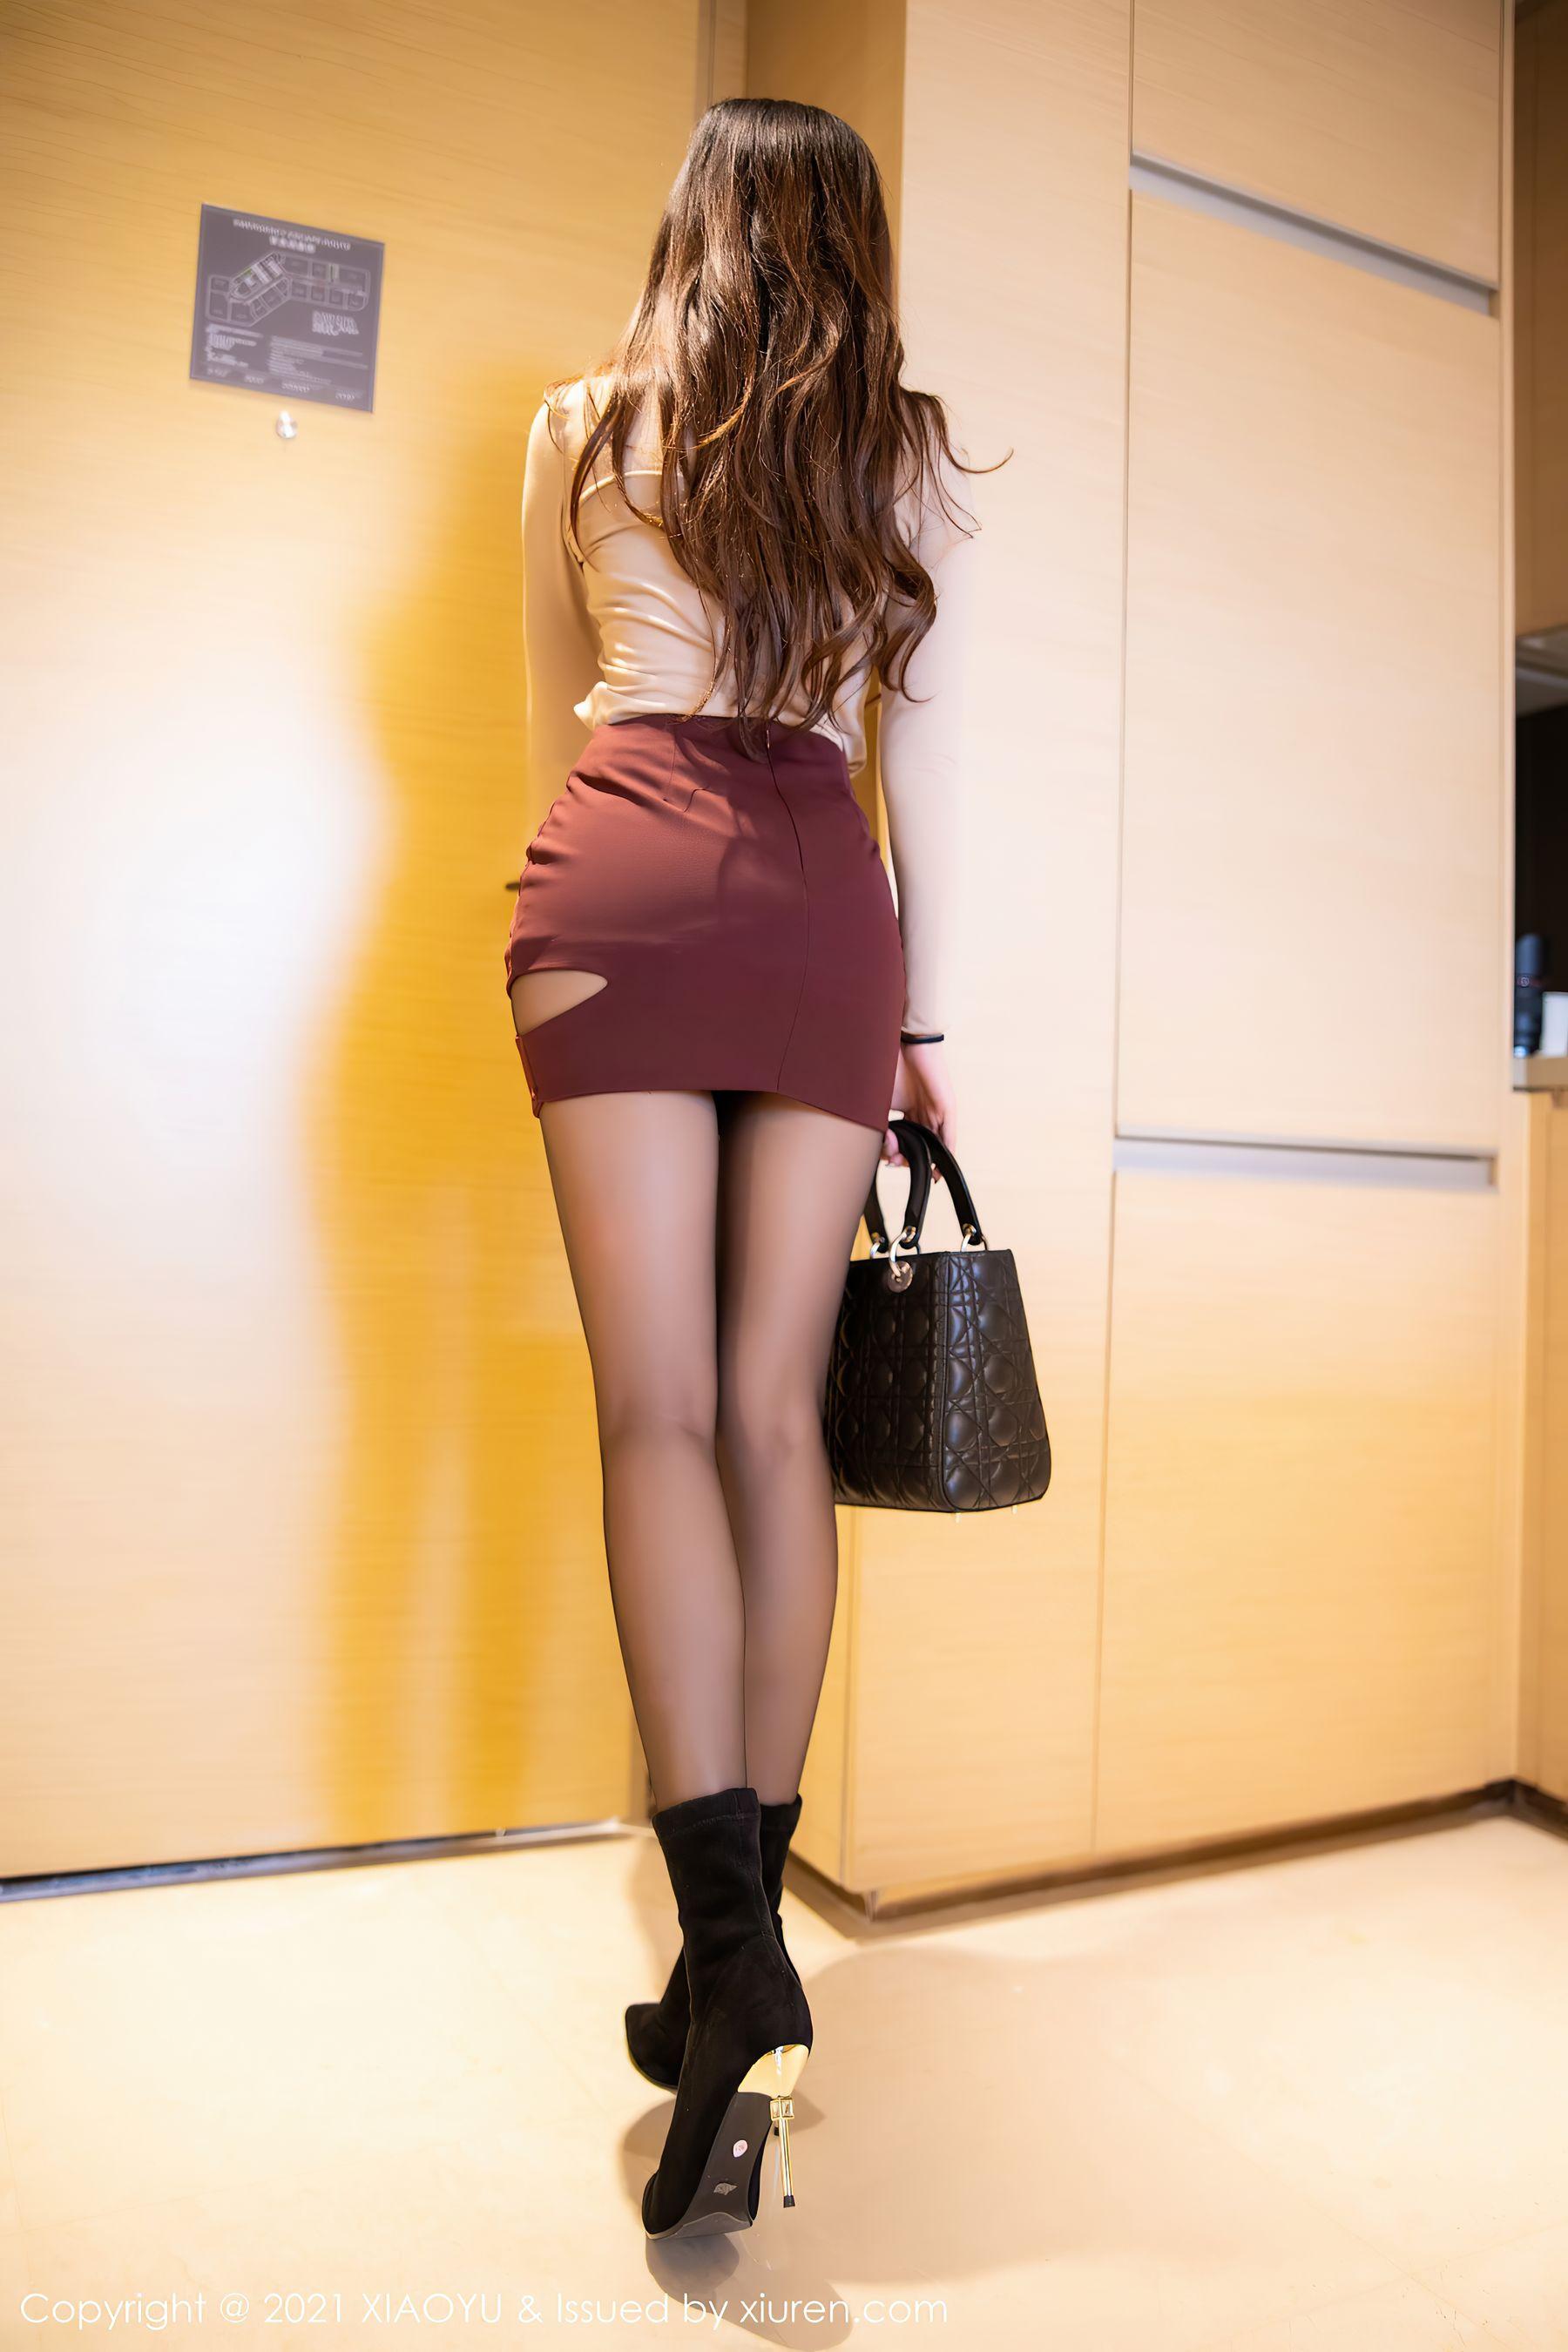 VOL.1893 [语画界]丝袜美臀丝袜女郎黑丝美腿:杨紫嫣(杨紫嫣Cynthia)超高清写真套图(76P)